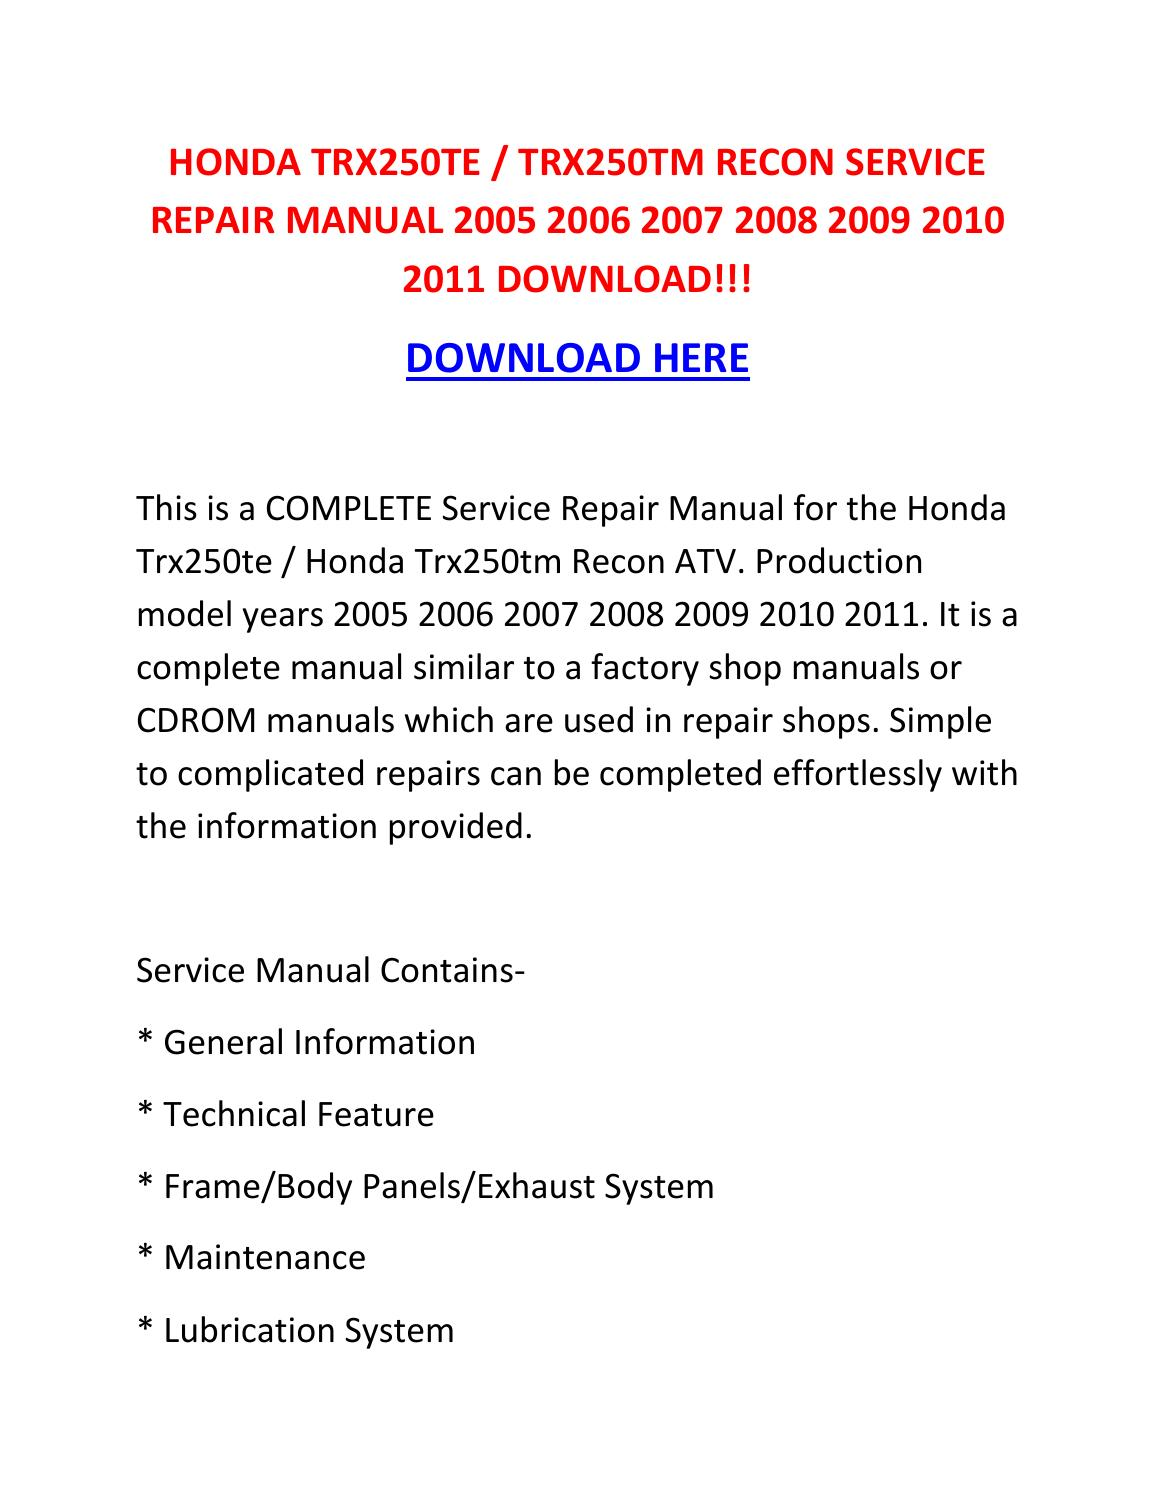 Honda Trx250te Trx250tm Recon Service Repair Manual 2005